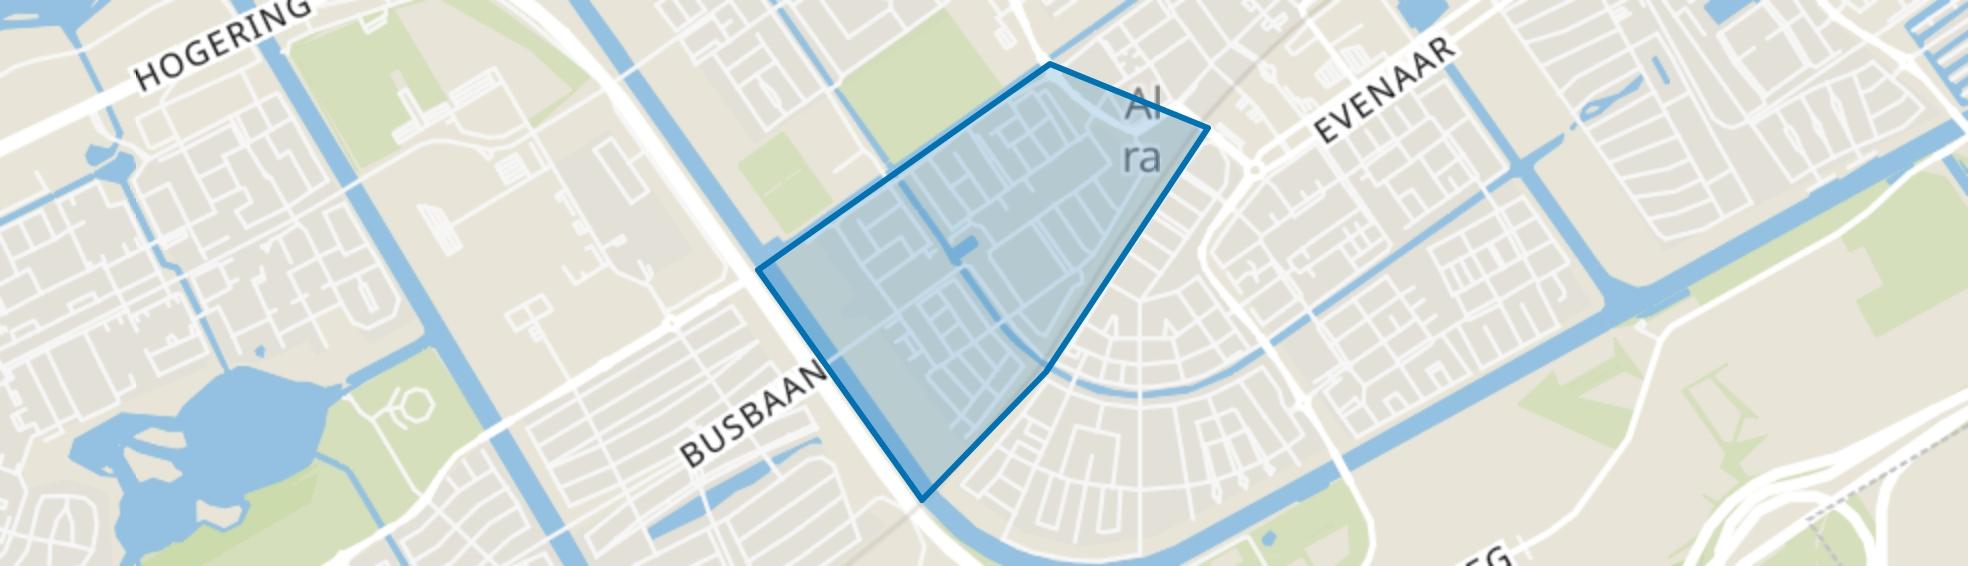 Landgoederenbuurt, Almere map